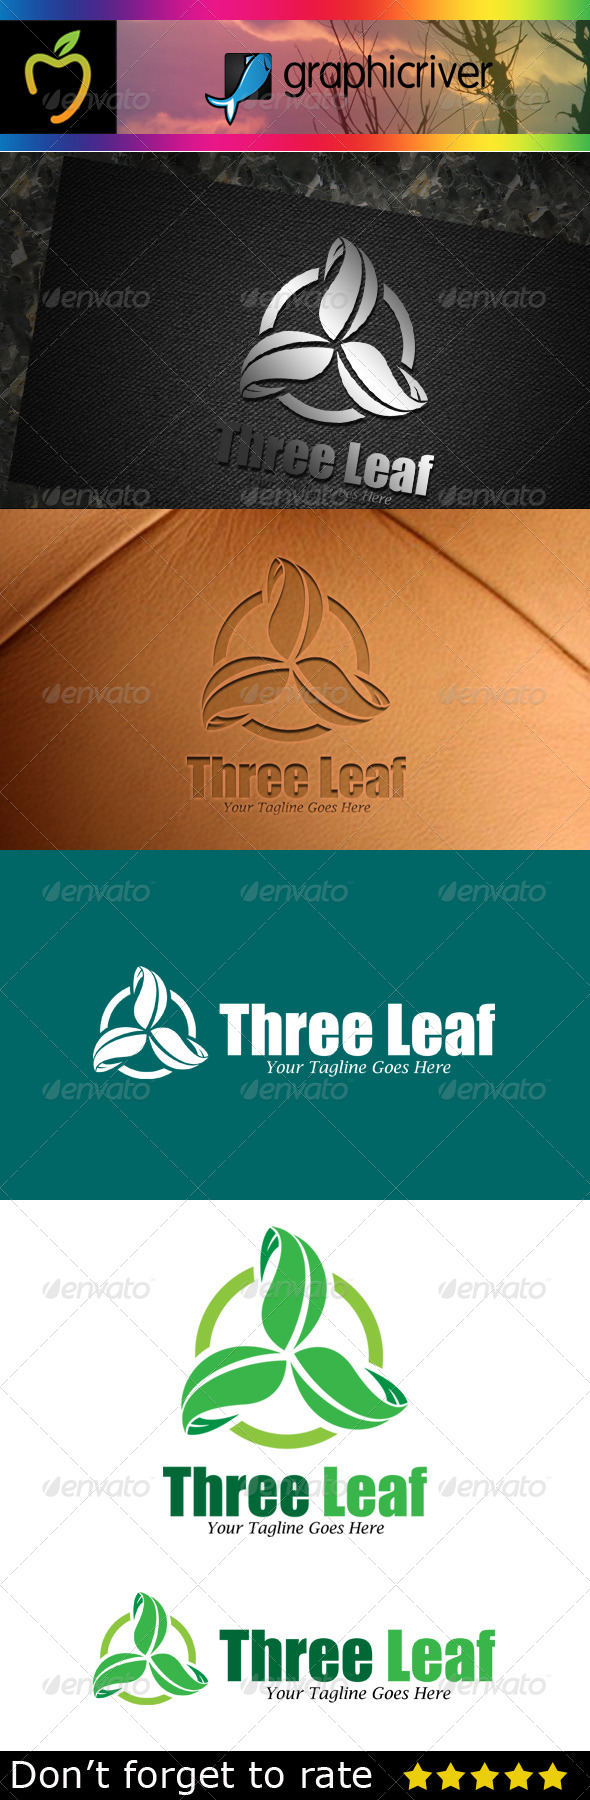 GraphicRiver Three Leaf Logo 7783369